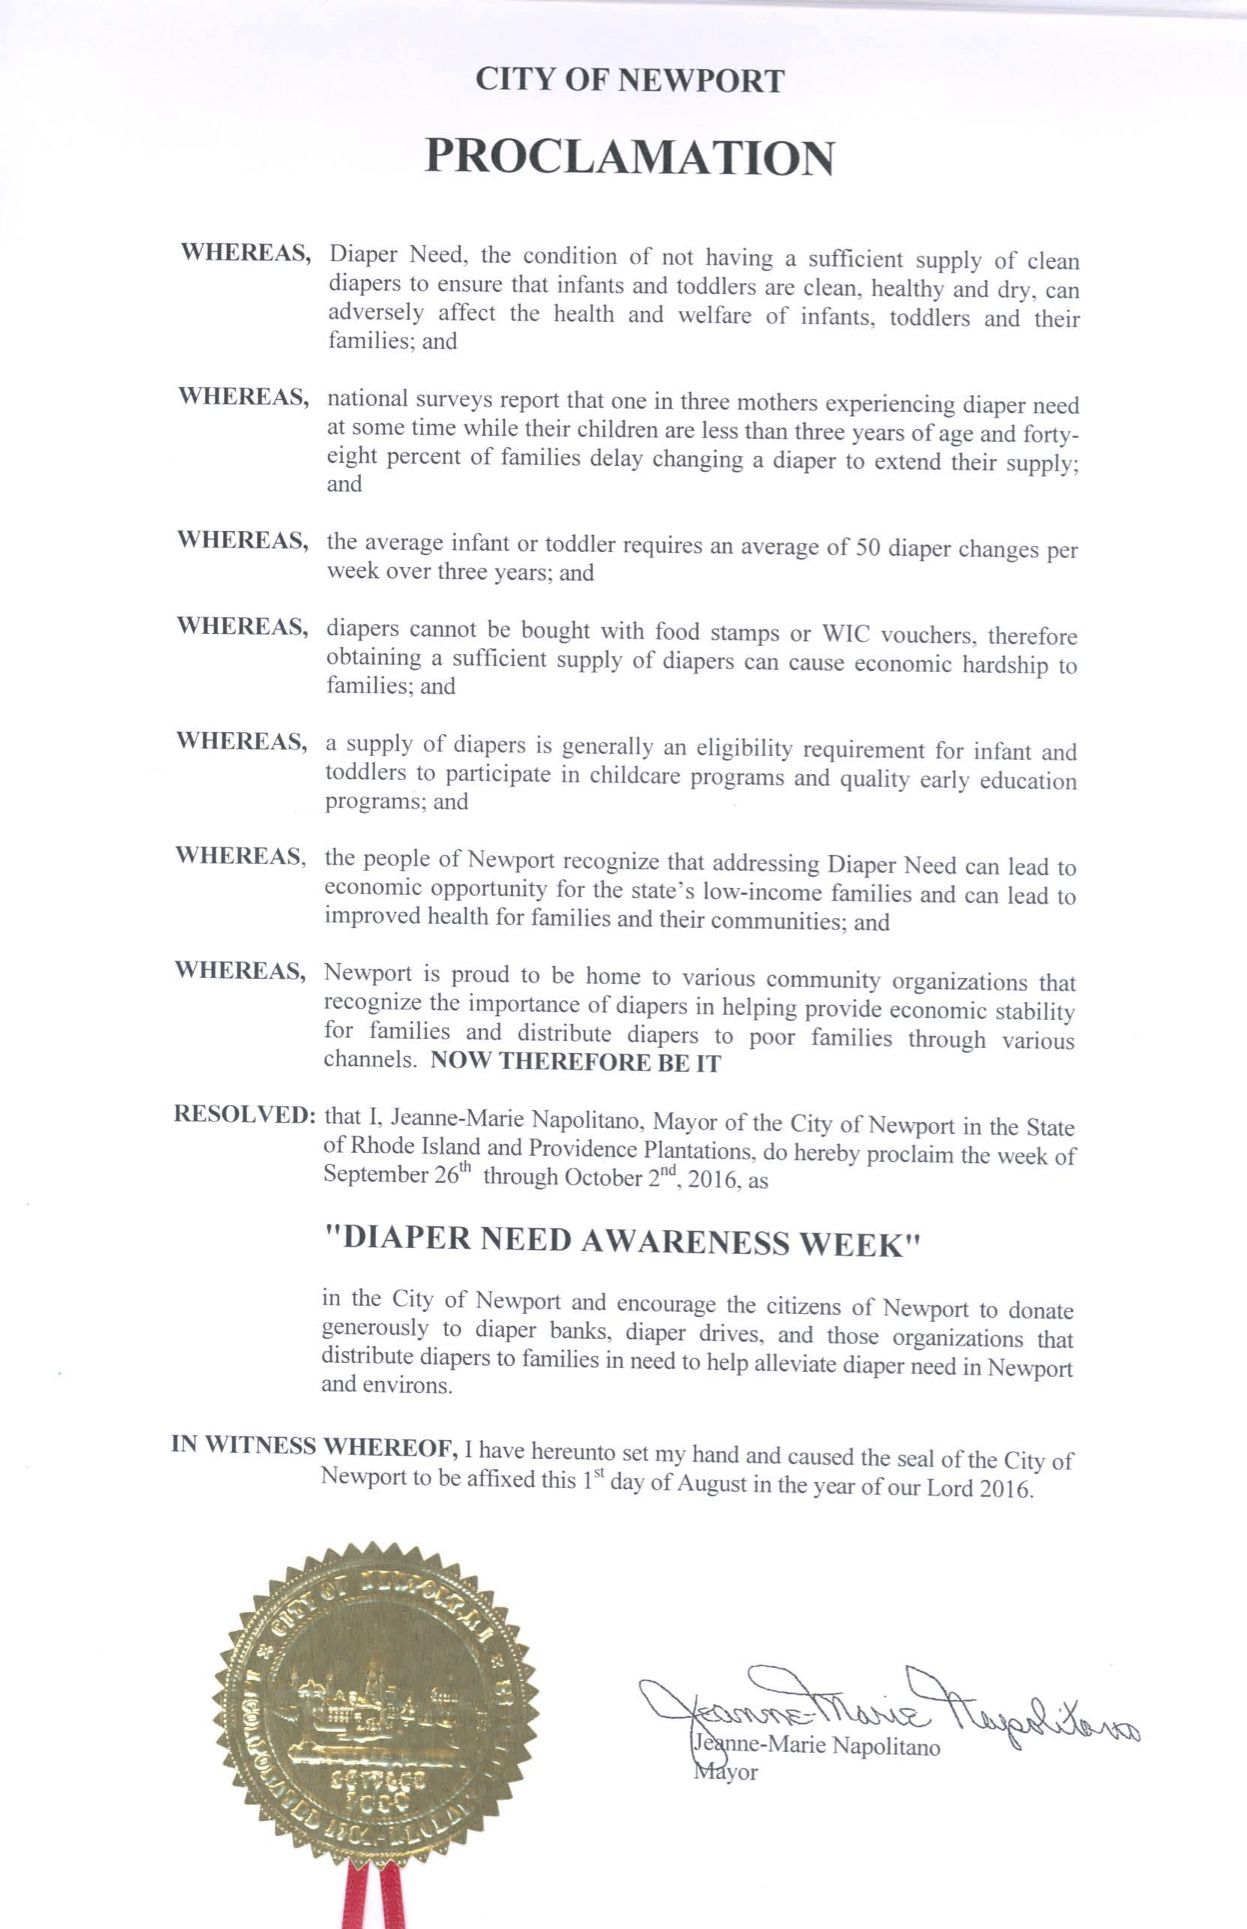 NEWPORT, RI - Mayoral proclamation recognizing Diaper Need Awareness Week (Sep. 26 - Oct 2, 2016) #DiaperNeed diaperneed.org